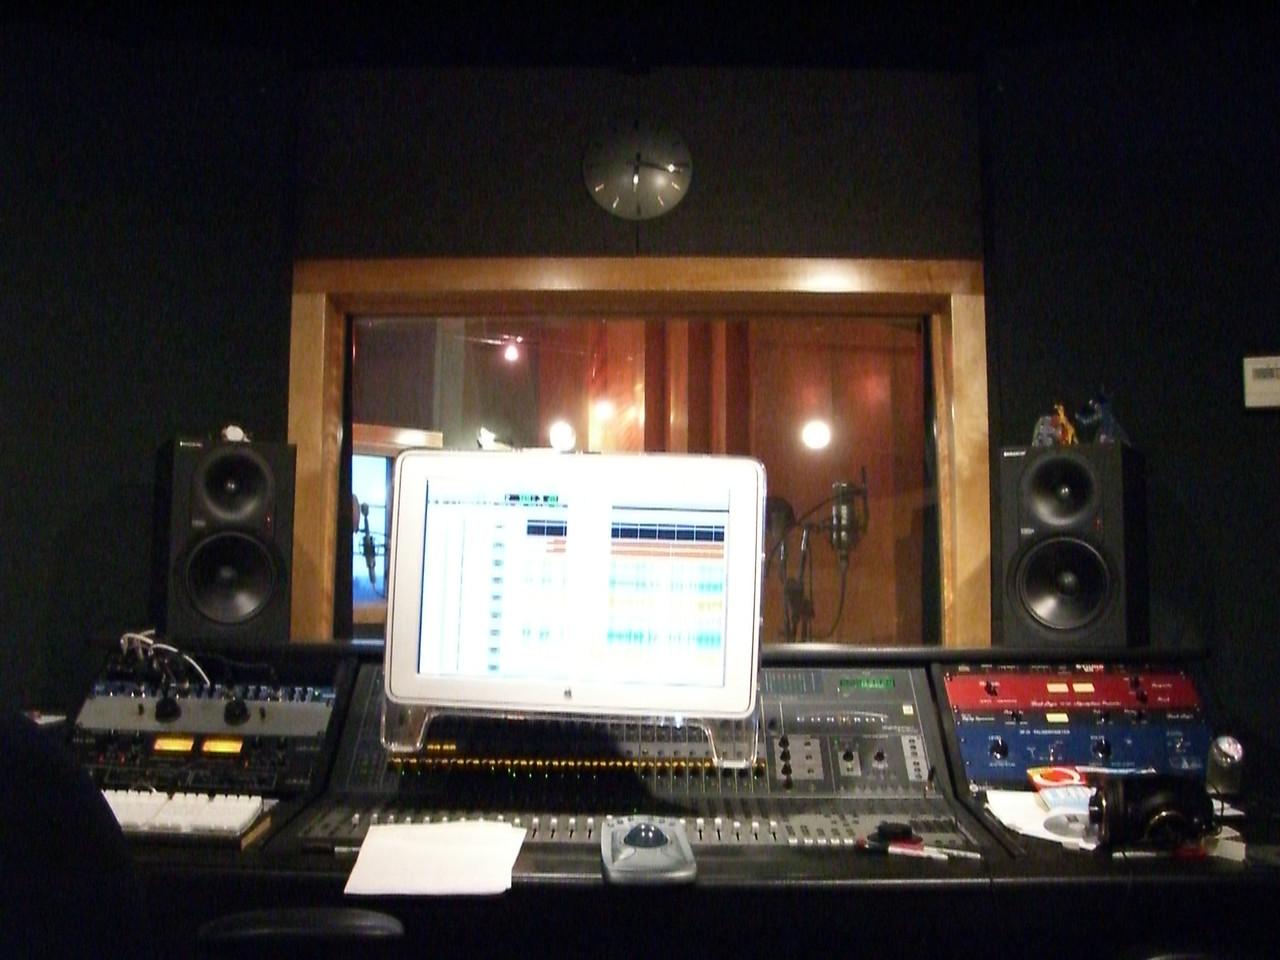 2006 03 02 Thu - At Bill Hare's studio - Soundboard